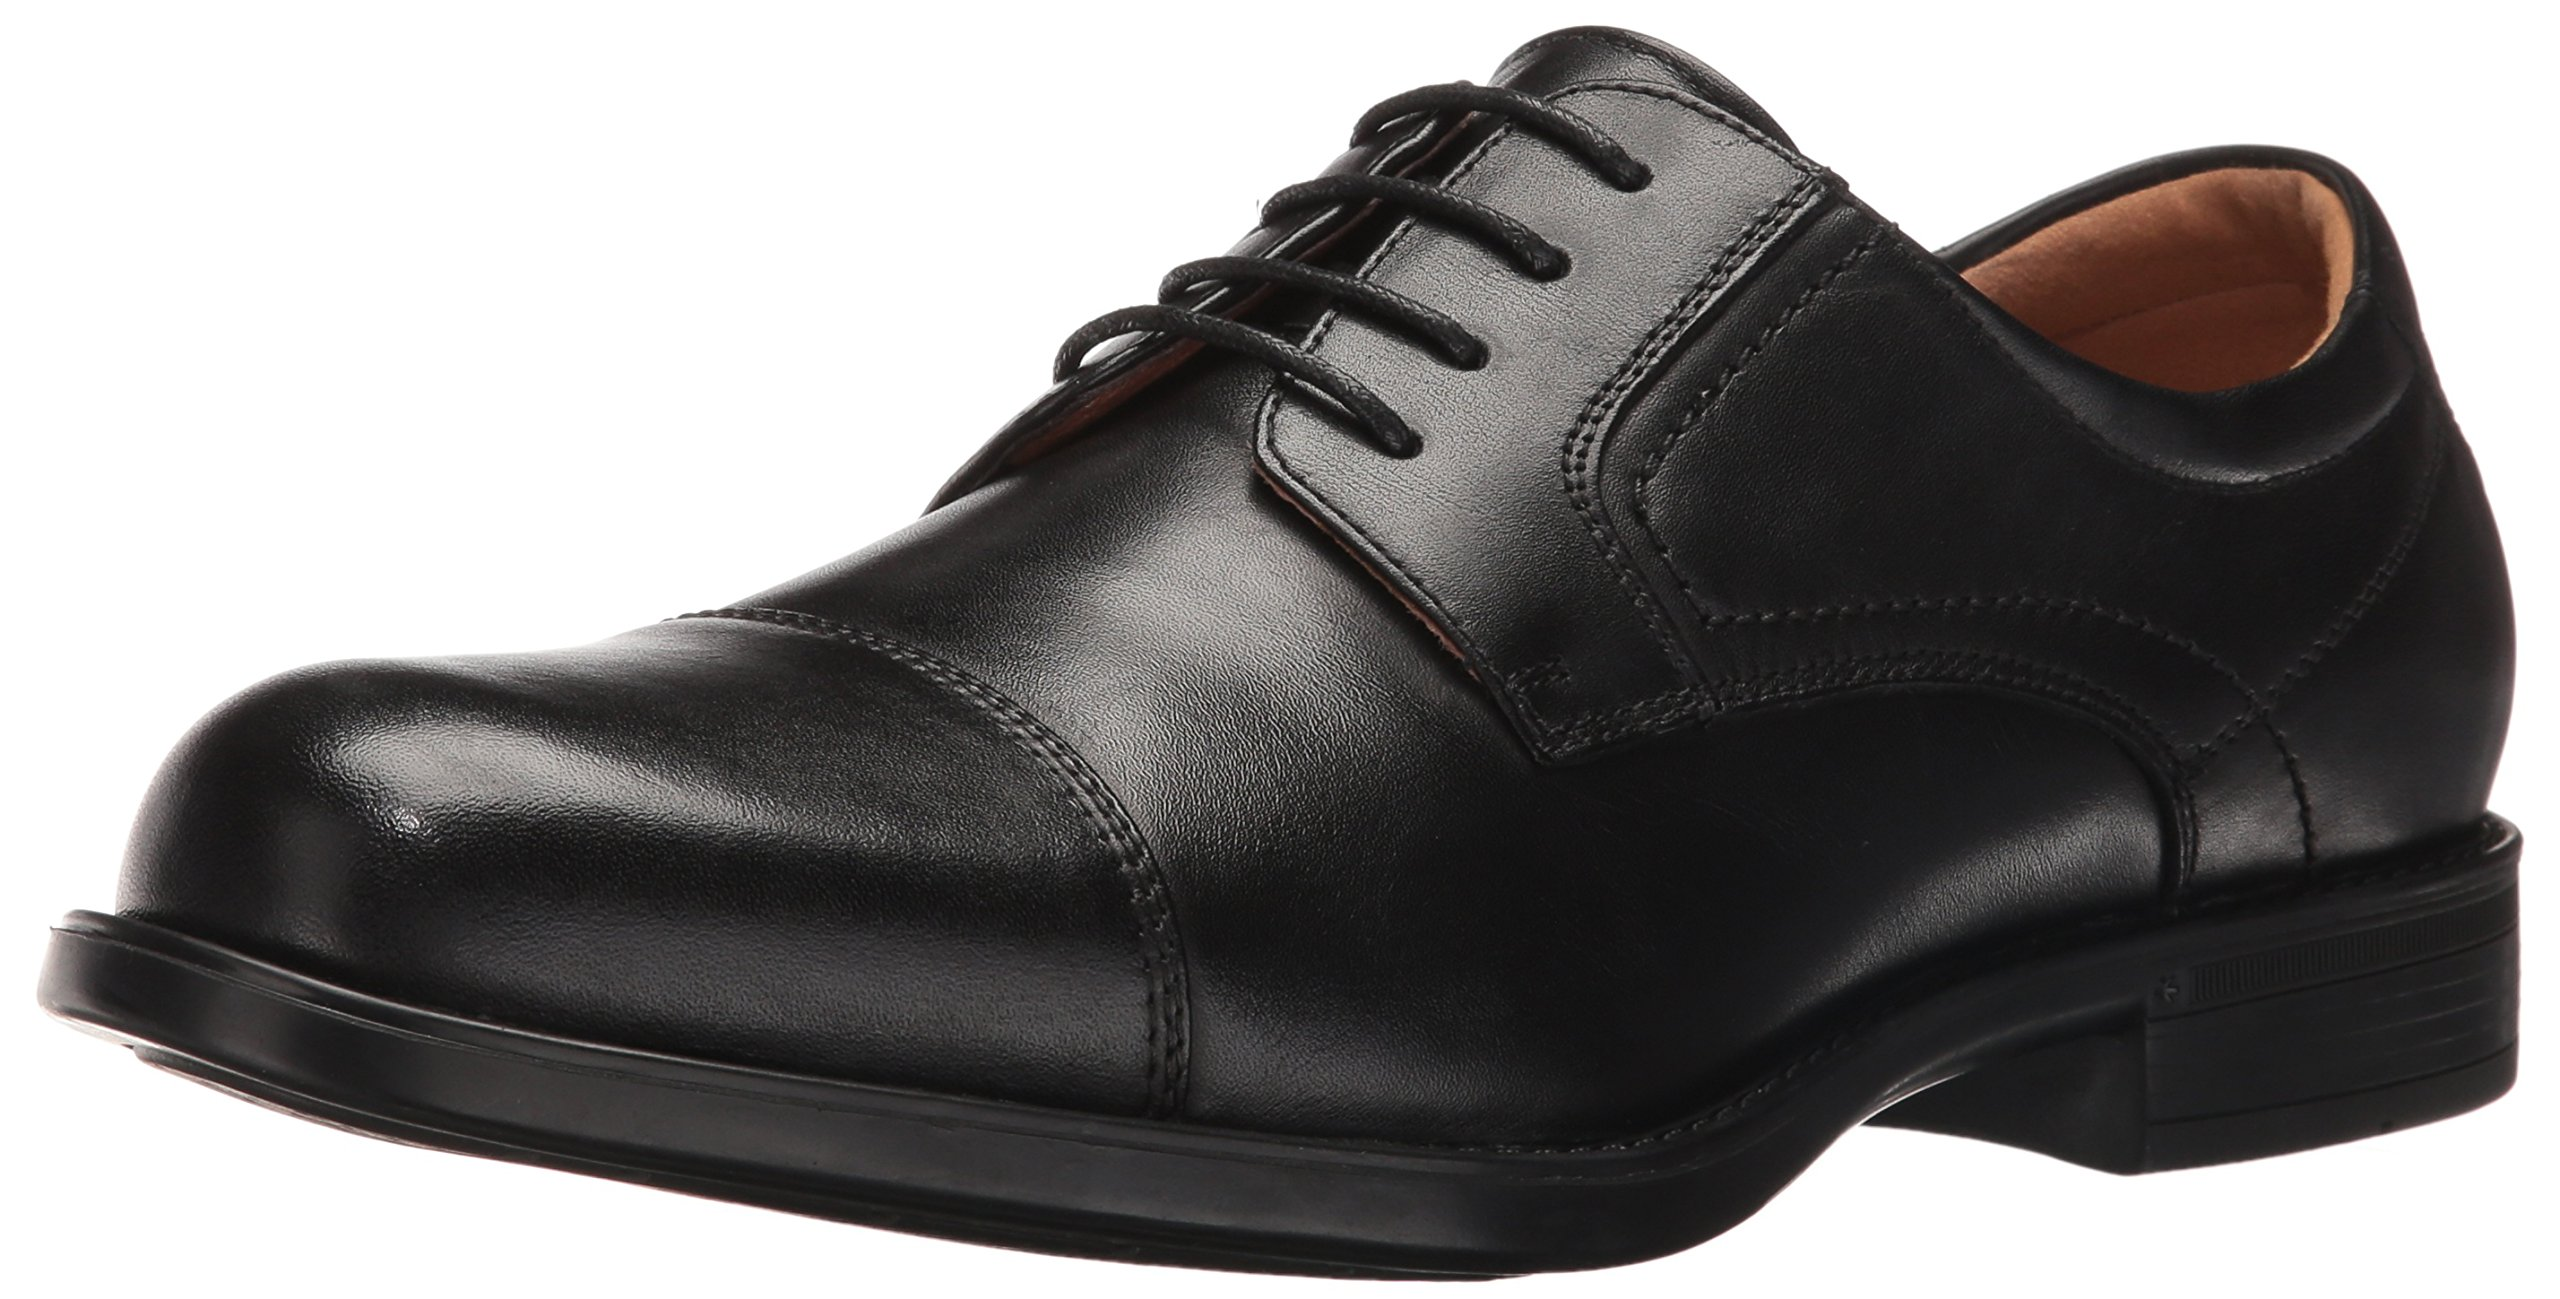 Florsheim Men's Medfield Cap Toe Oxford Dress Shoe, Black, 10.5 Wide by Florsheim